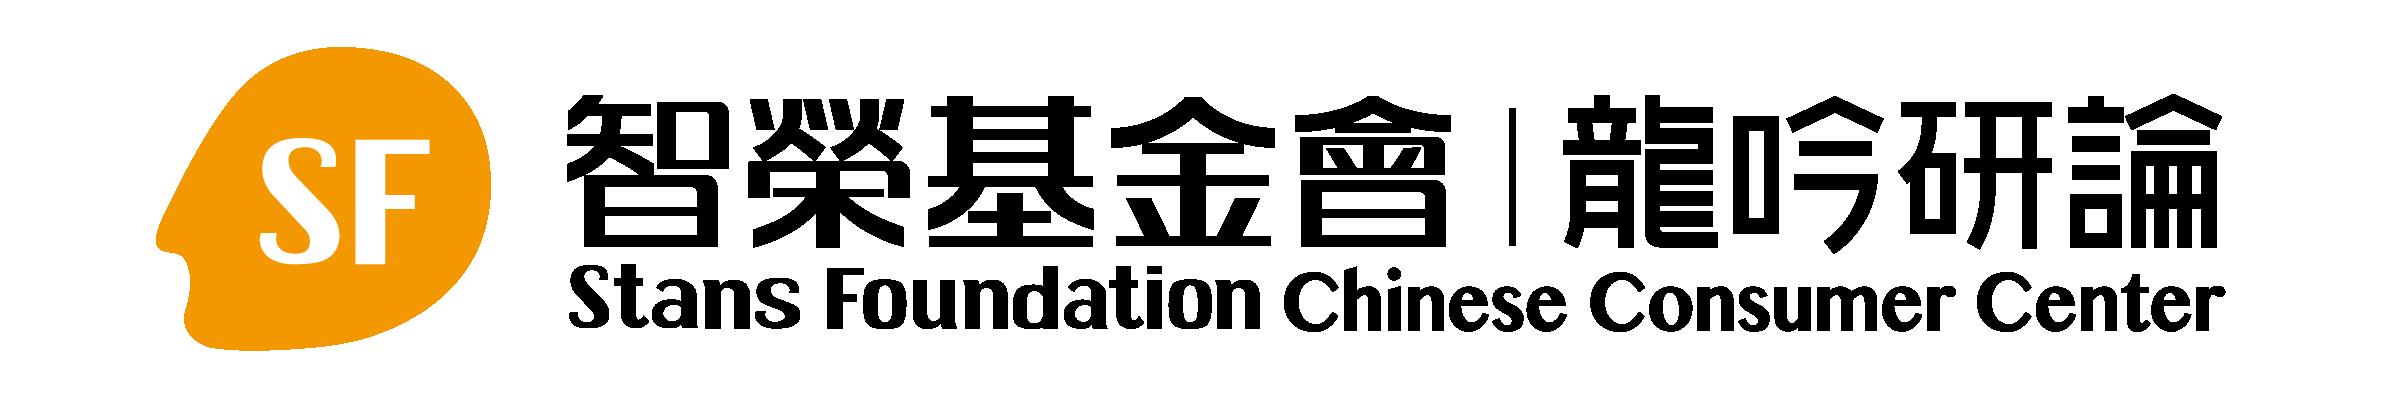 cropped-龍吟研論logo-中英.png